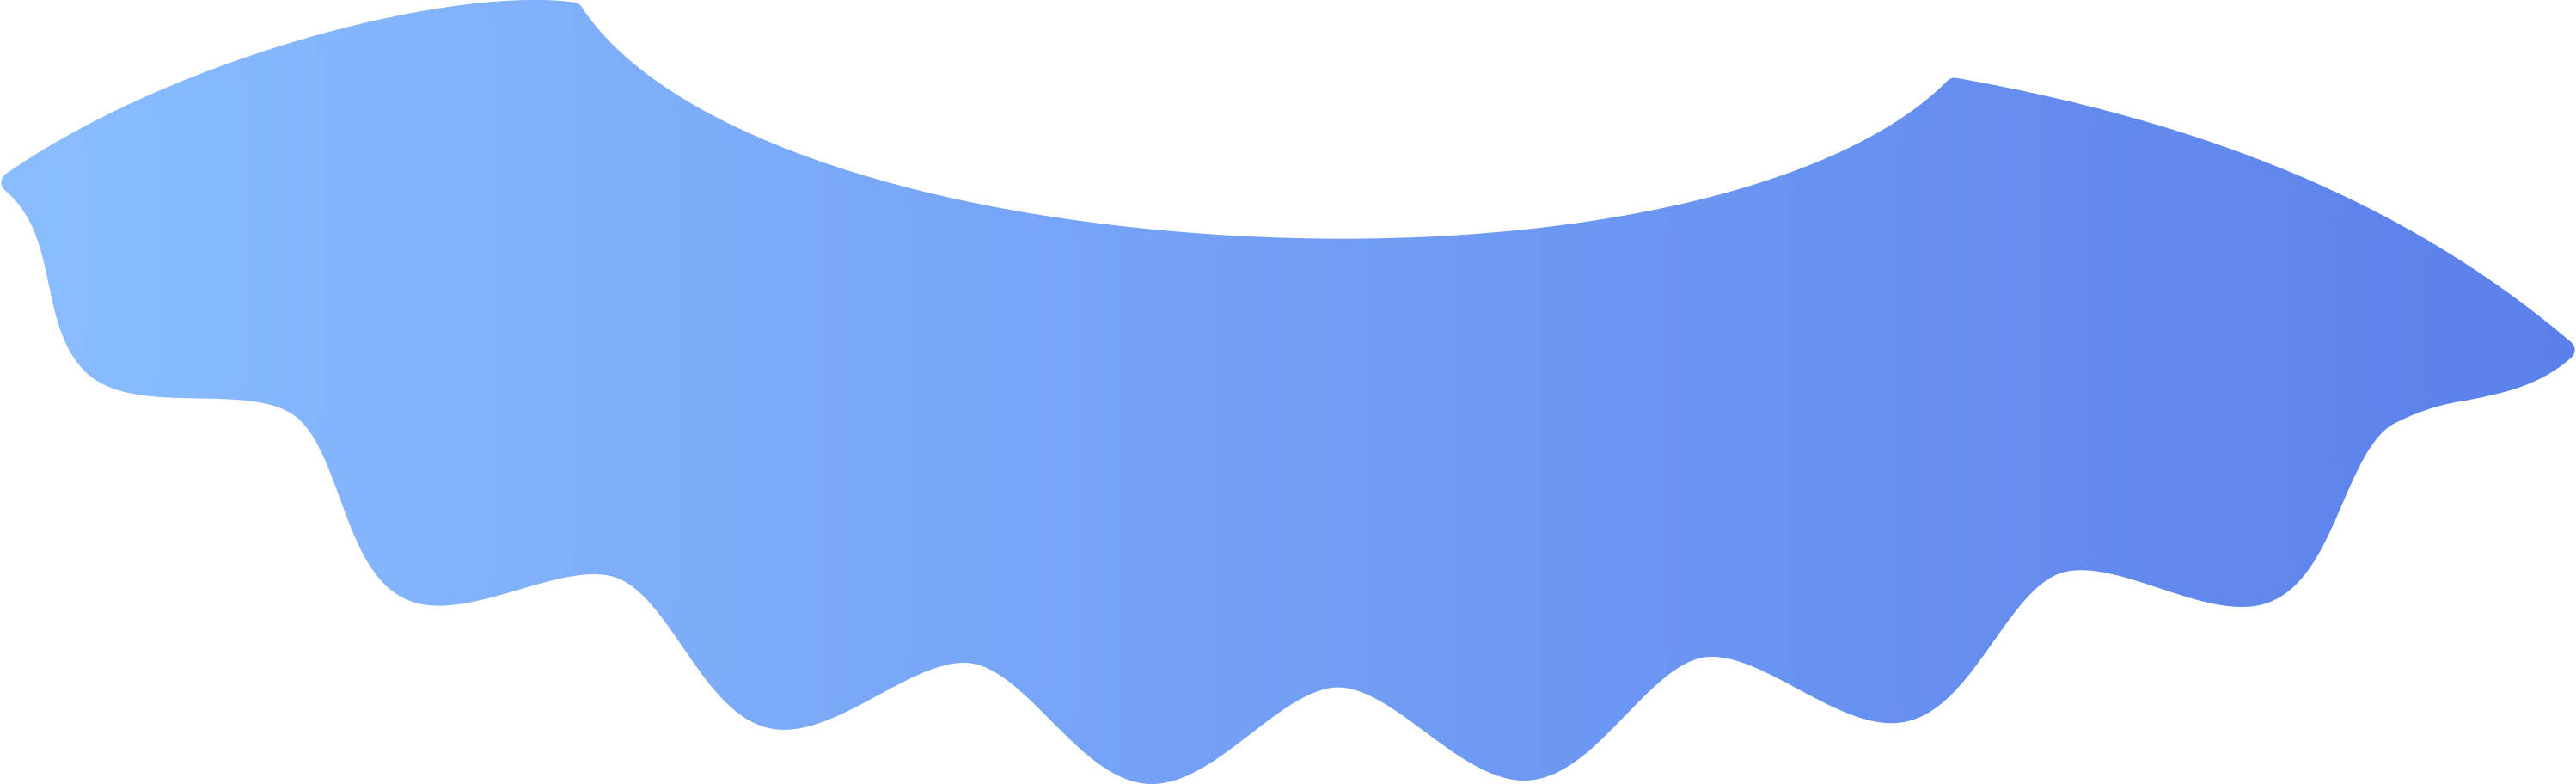 skirt Clipart illustration in PNG, SVG